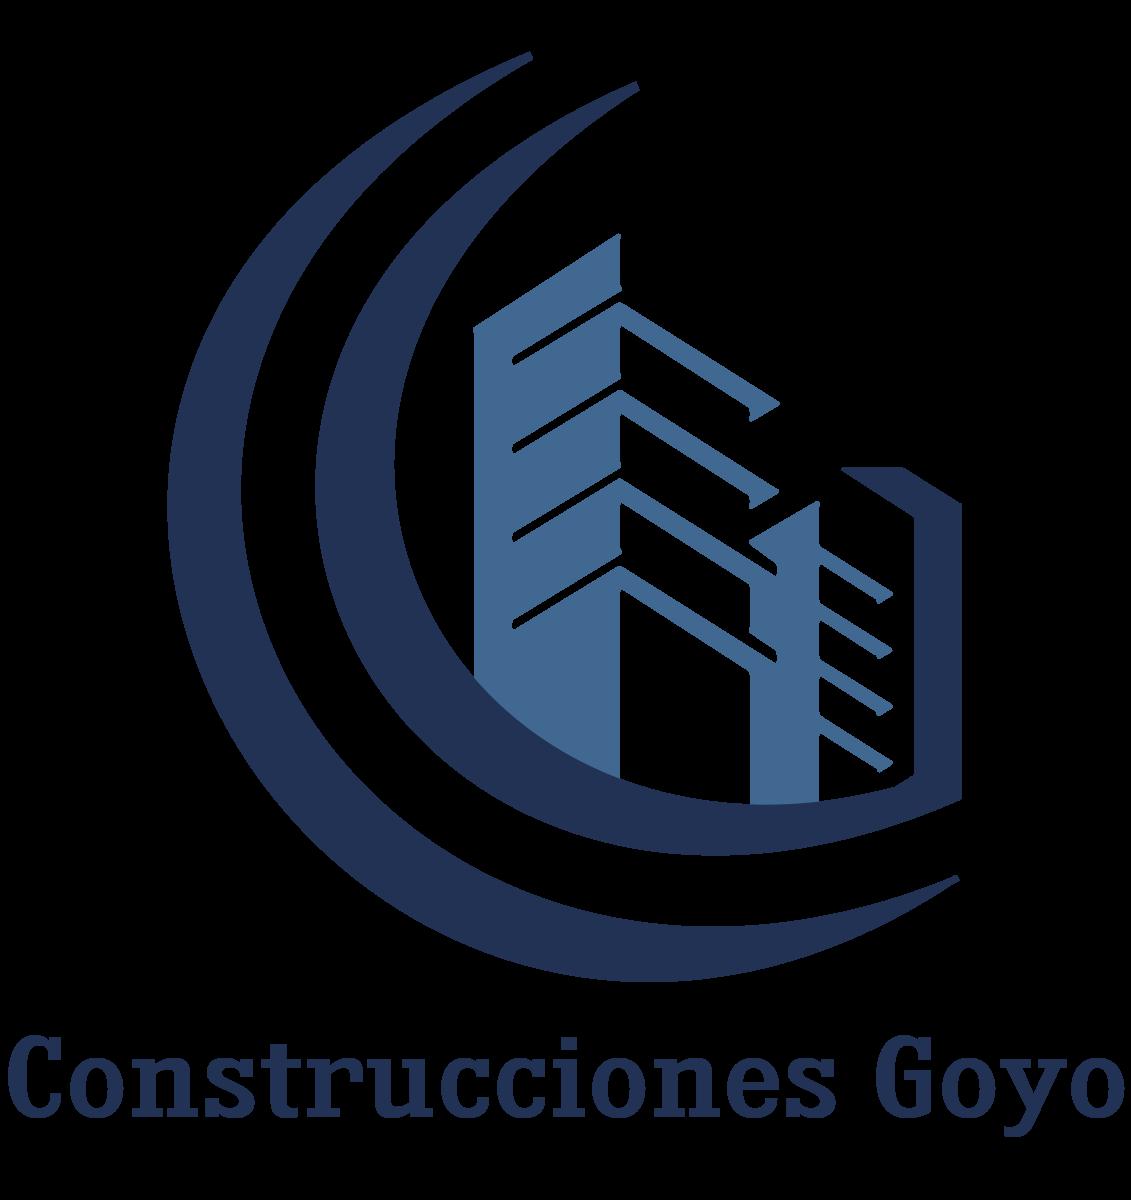 Construcciones Goyo, S.l.